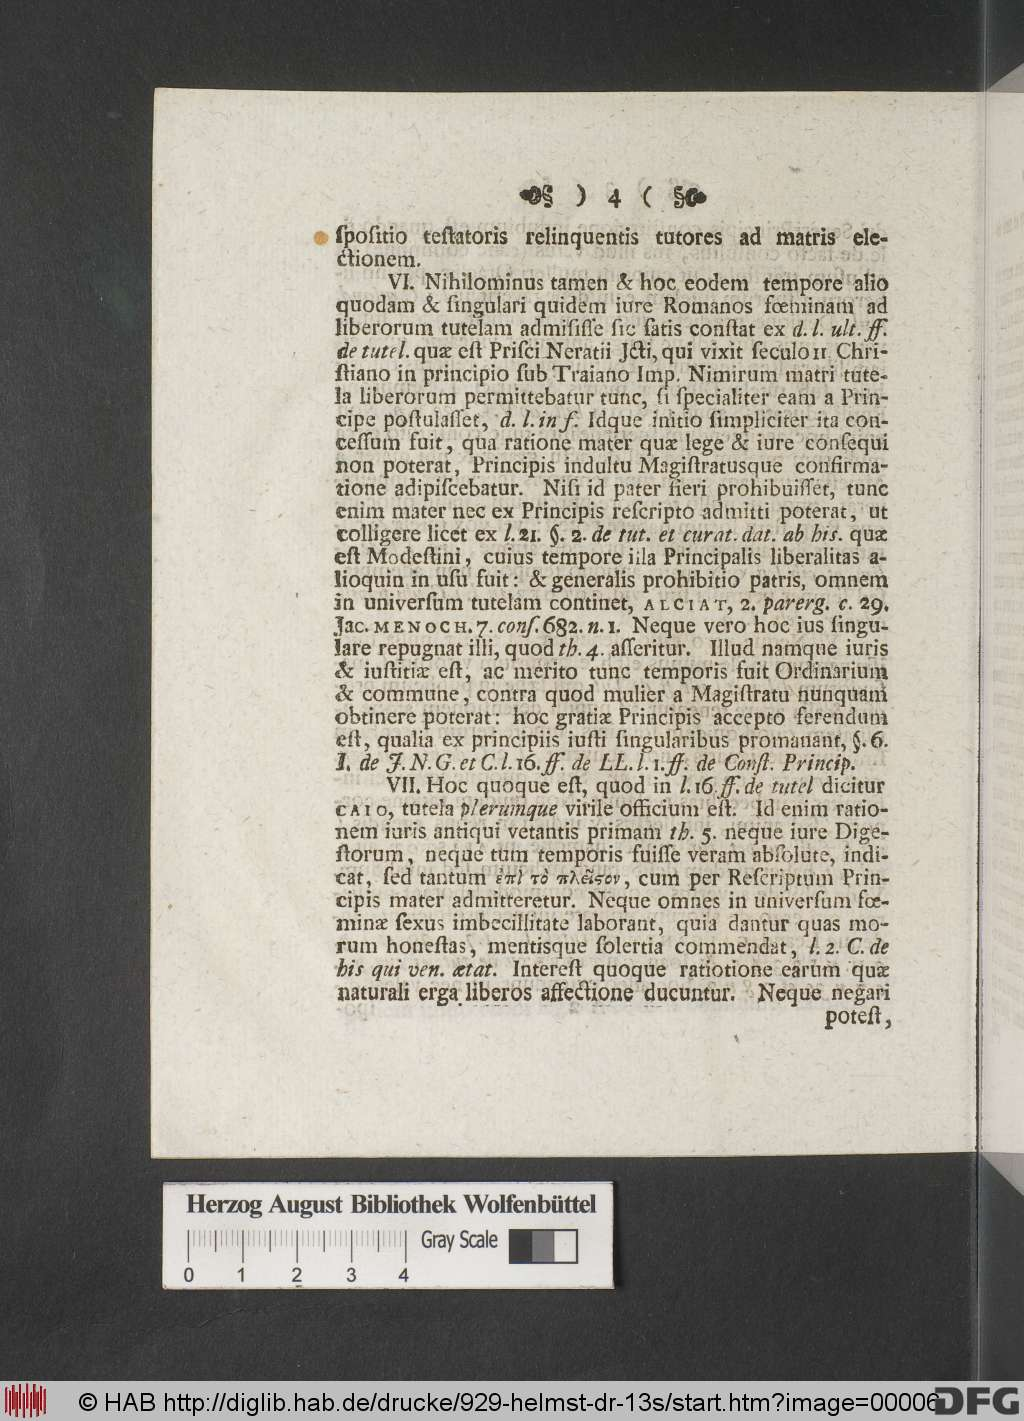 https://diglib.hab.de/drucke/929-helmst-dr-13s/00006.jpg